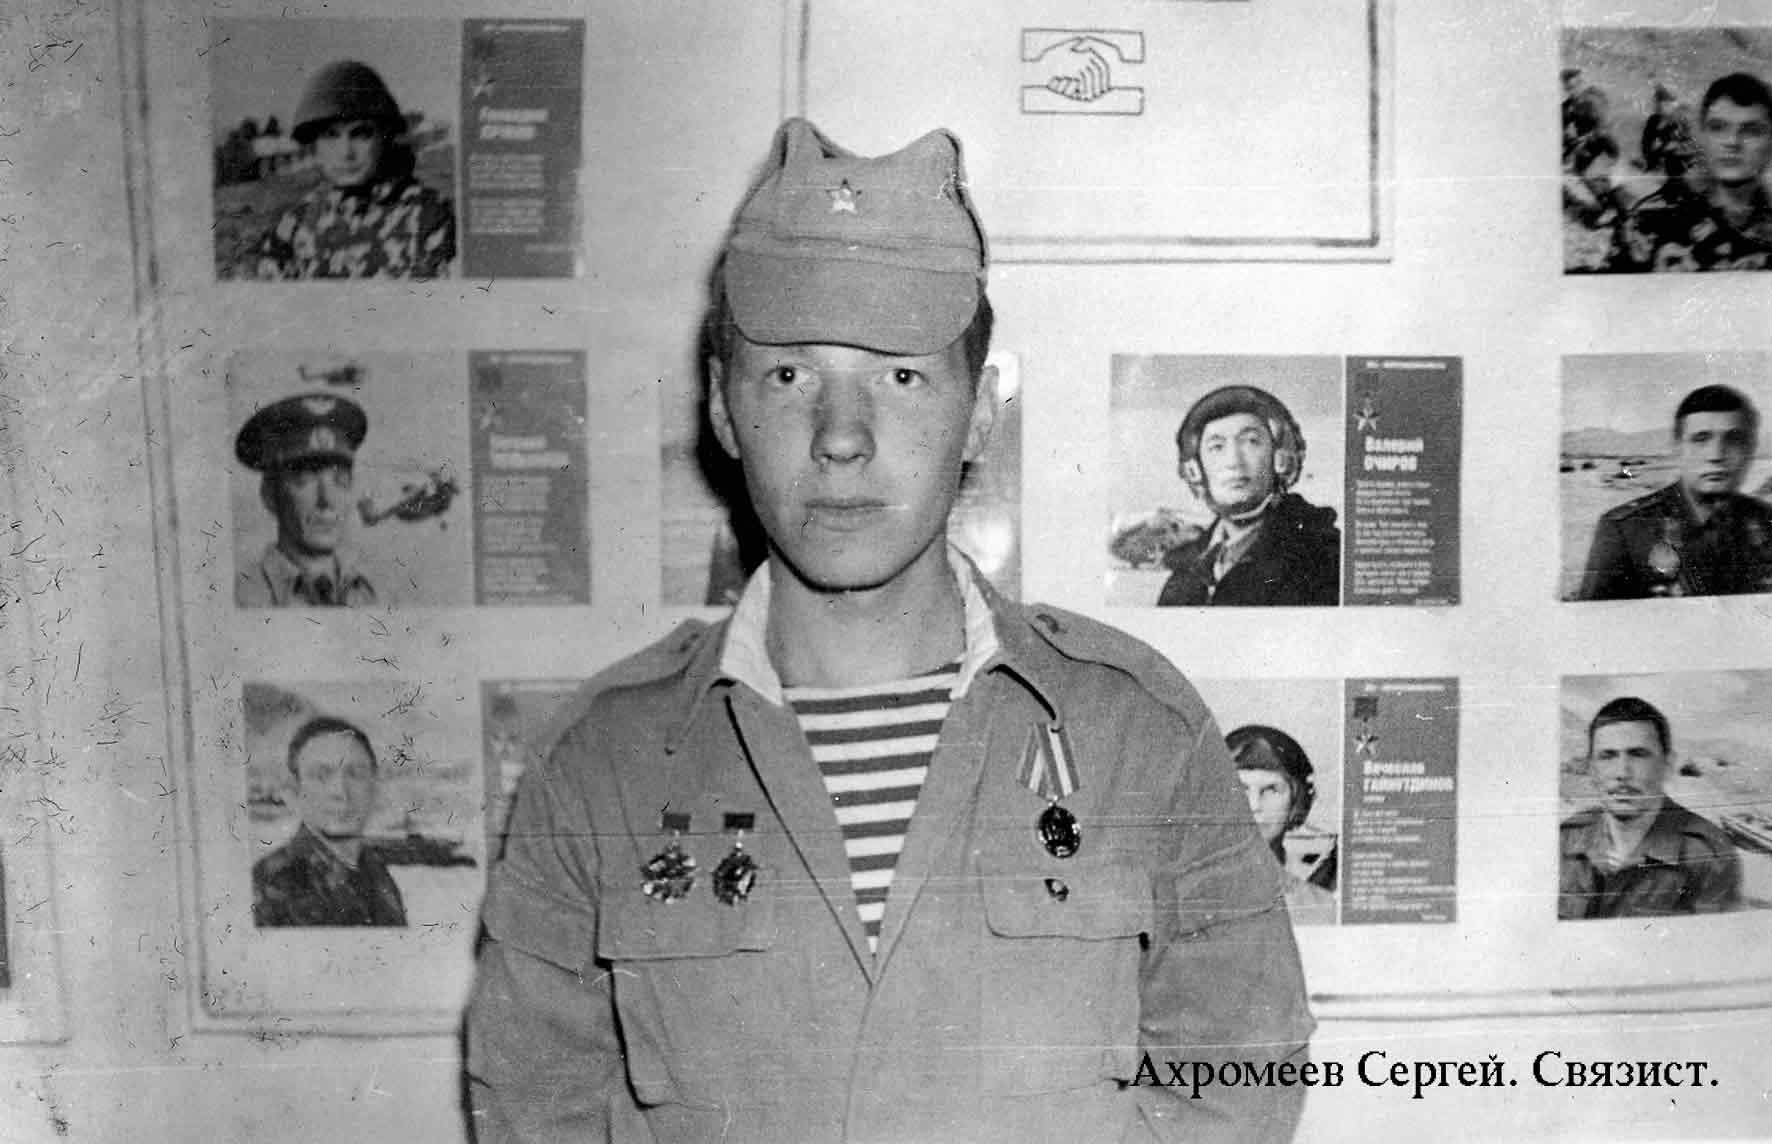 4ммг-Тути Иол весна 1989 г. Ахромеев Сергей - связист